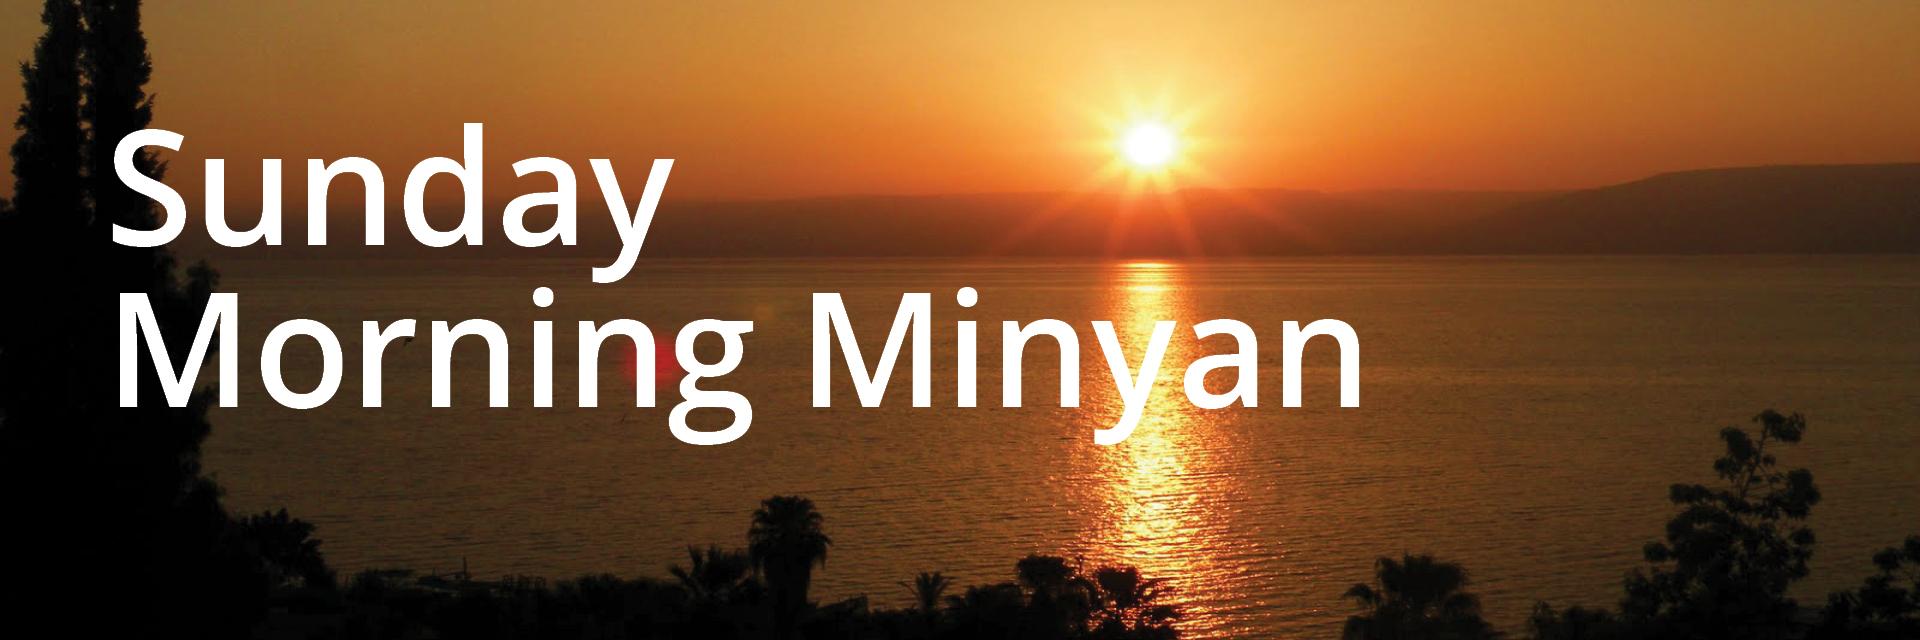 "<a href=""https://www.congkti.org/sunday-morning-minyan.html""                                     target="""">                                                                 <span class=""slider_title"">                                     Sundays at 8:30 am                                </span>                                                                 </a>                                                                                                                                                                                       <span class=""slider_description"">Be a part of our minyan.</span>                                                                                     <a href=""https://www.congkti.org/sunday-morning-minyan.html"" class=""slider_link""                             target="""">                             Read more here...                            </a>"